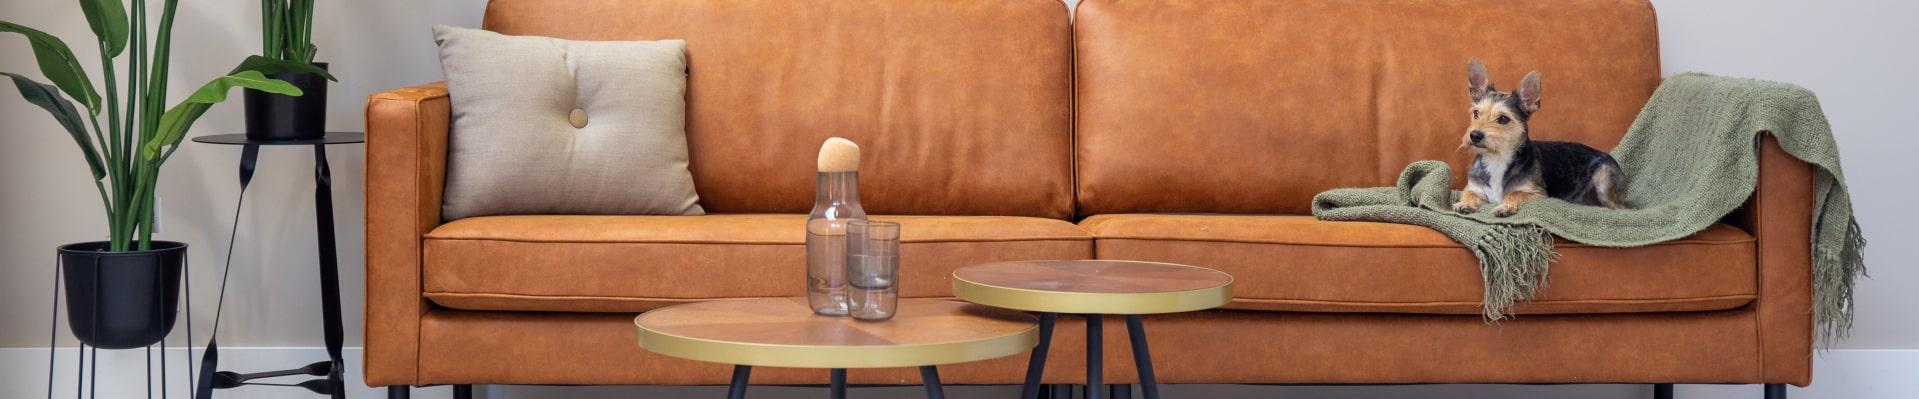 Livingstone Design fauteuils